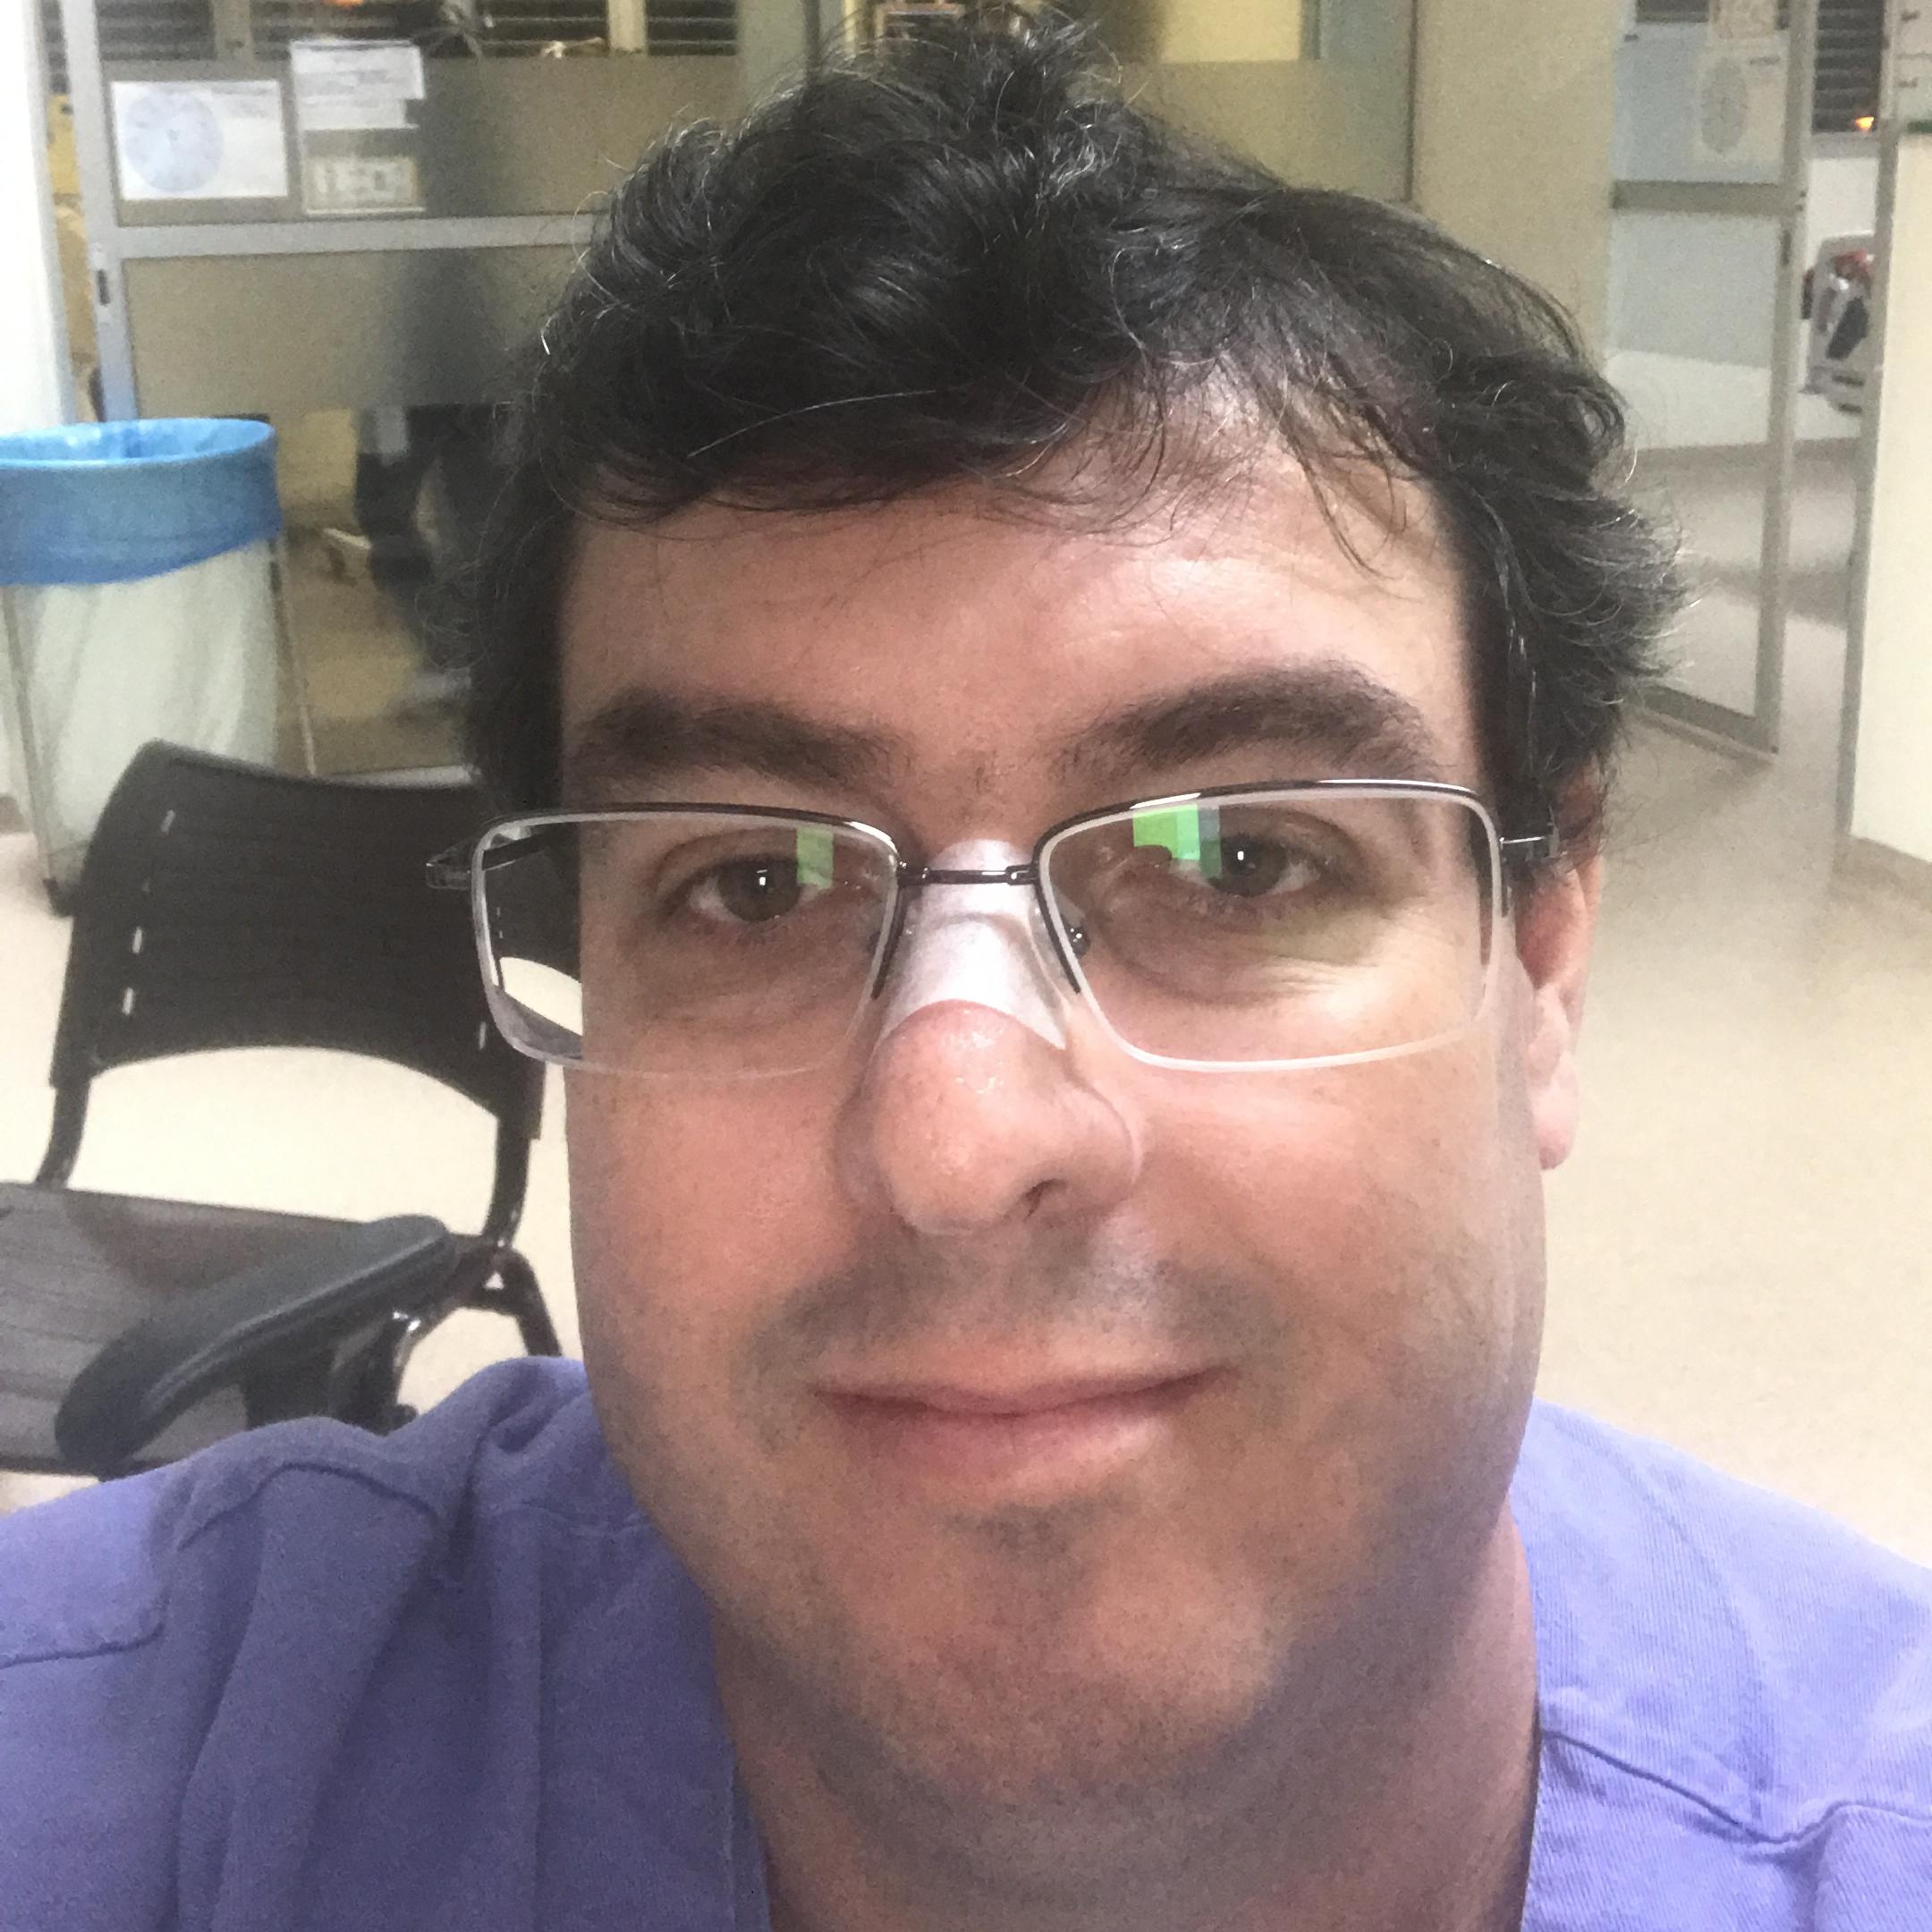 Mauricio Trindade Ribeiro